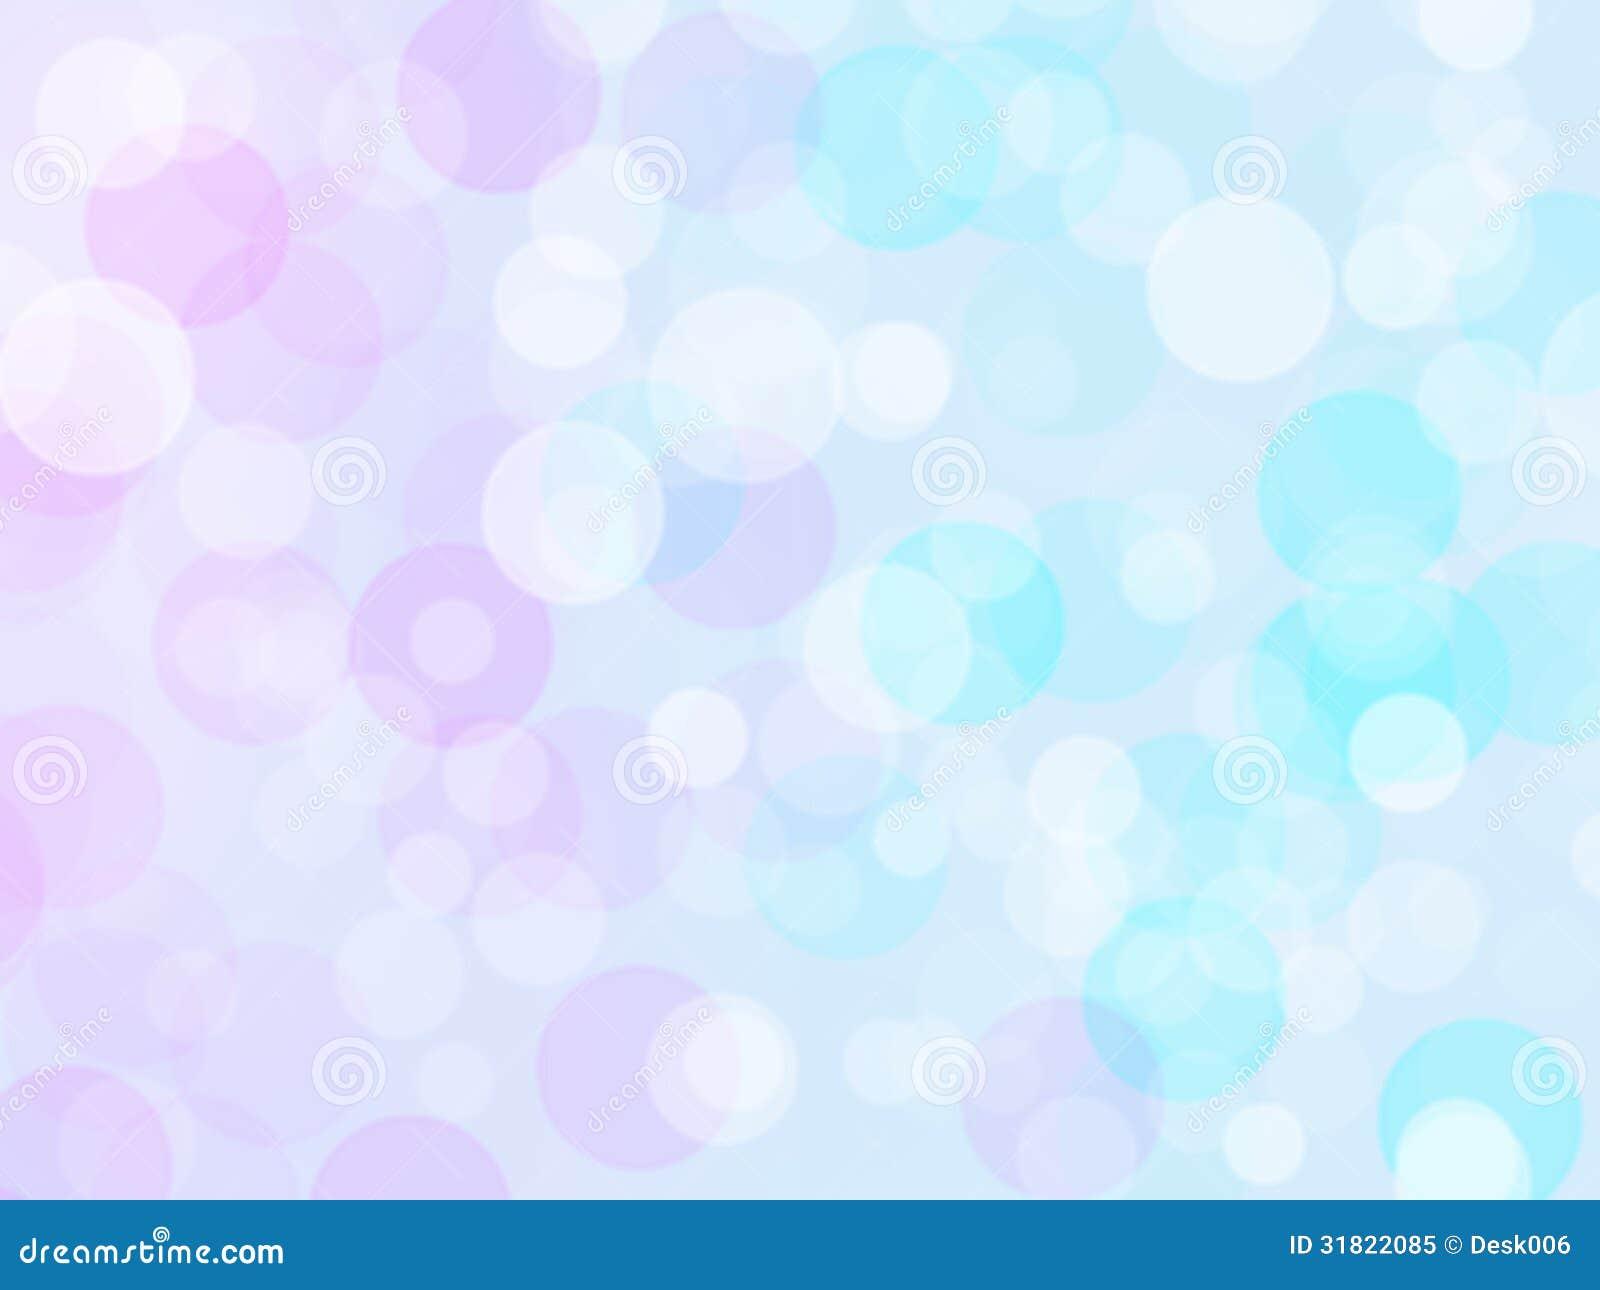 Pastel Colorful Background Bokeh Blurred Stock Illustration